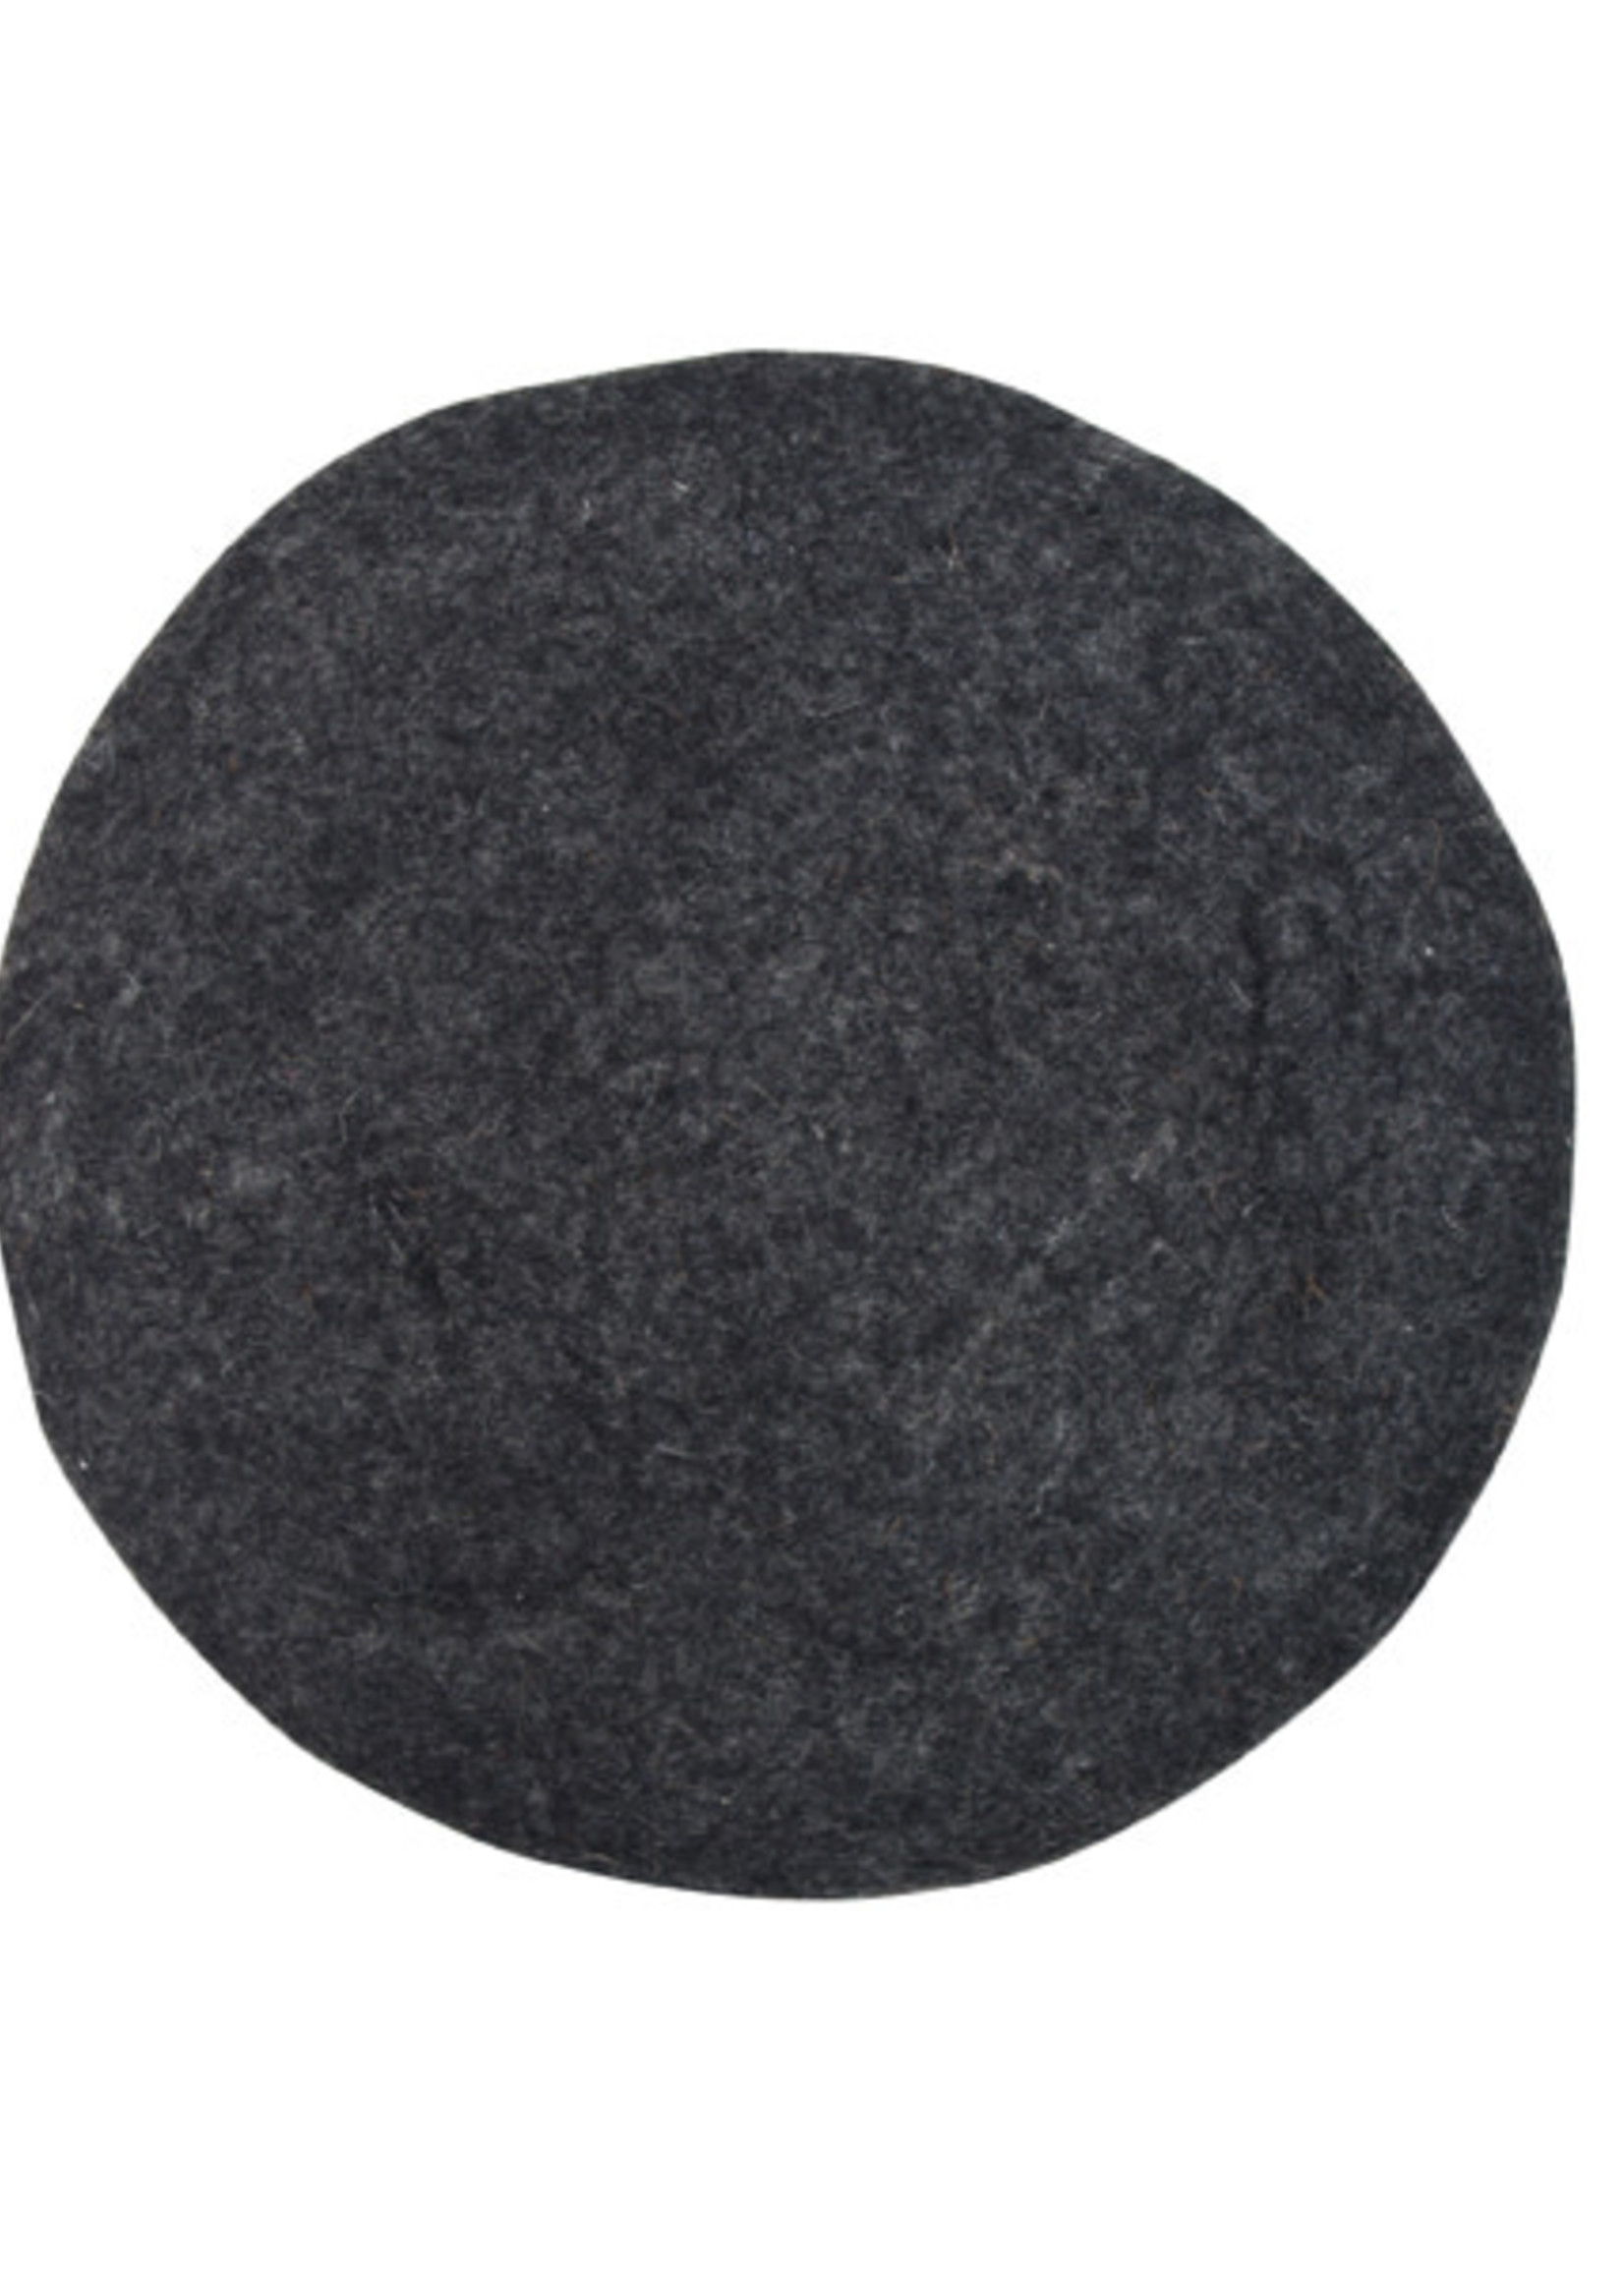 HKliving Felt seat cover charcoal